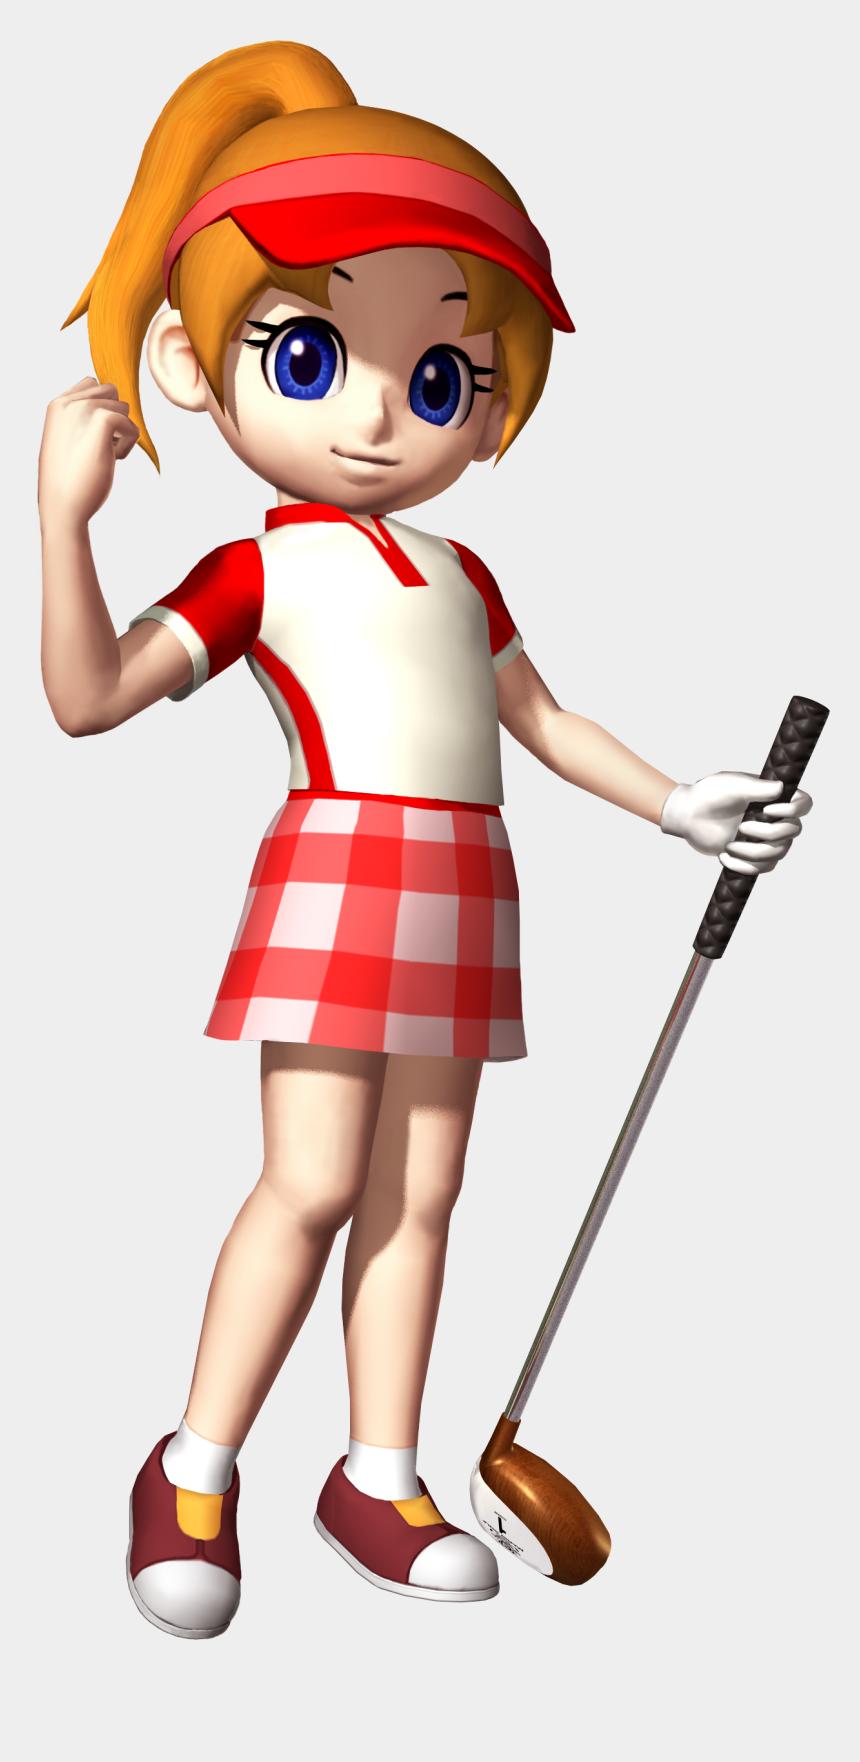 tour clipart, Cartoons - Yoshi Clipart Mario Golf Toadstool Tour - Mario Golf Advance Tour Ella